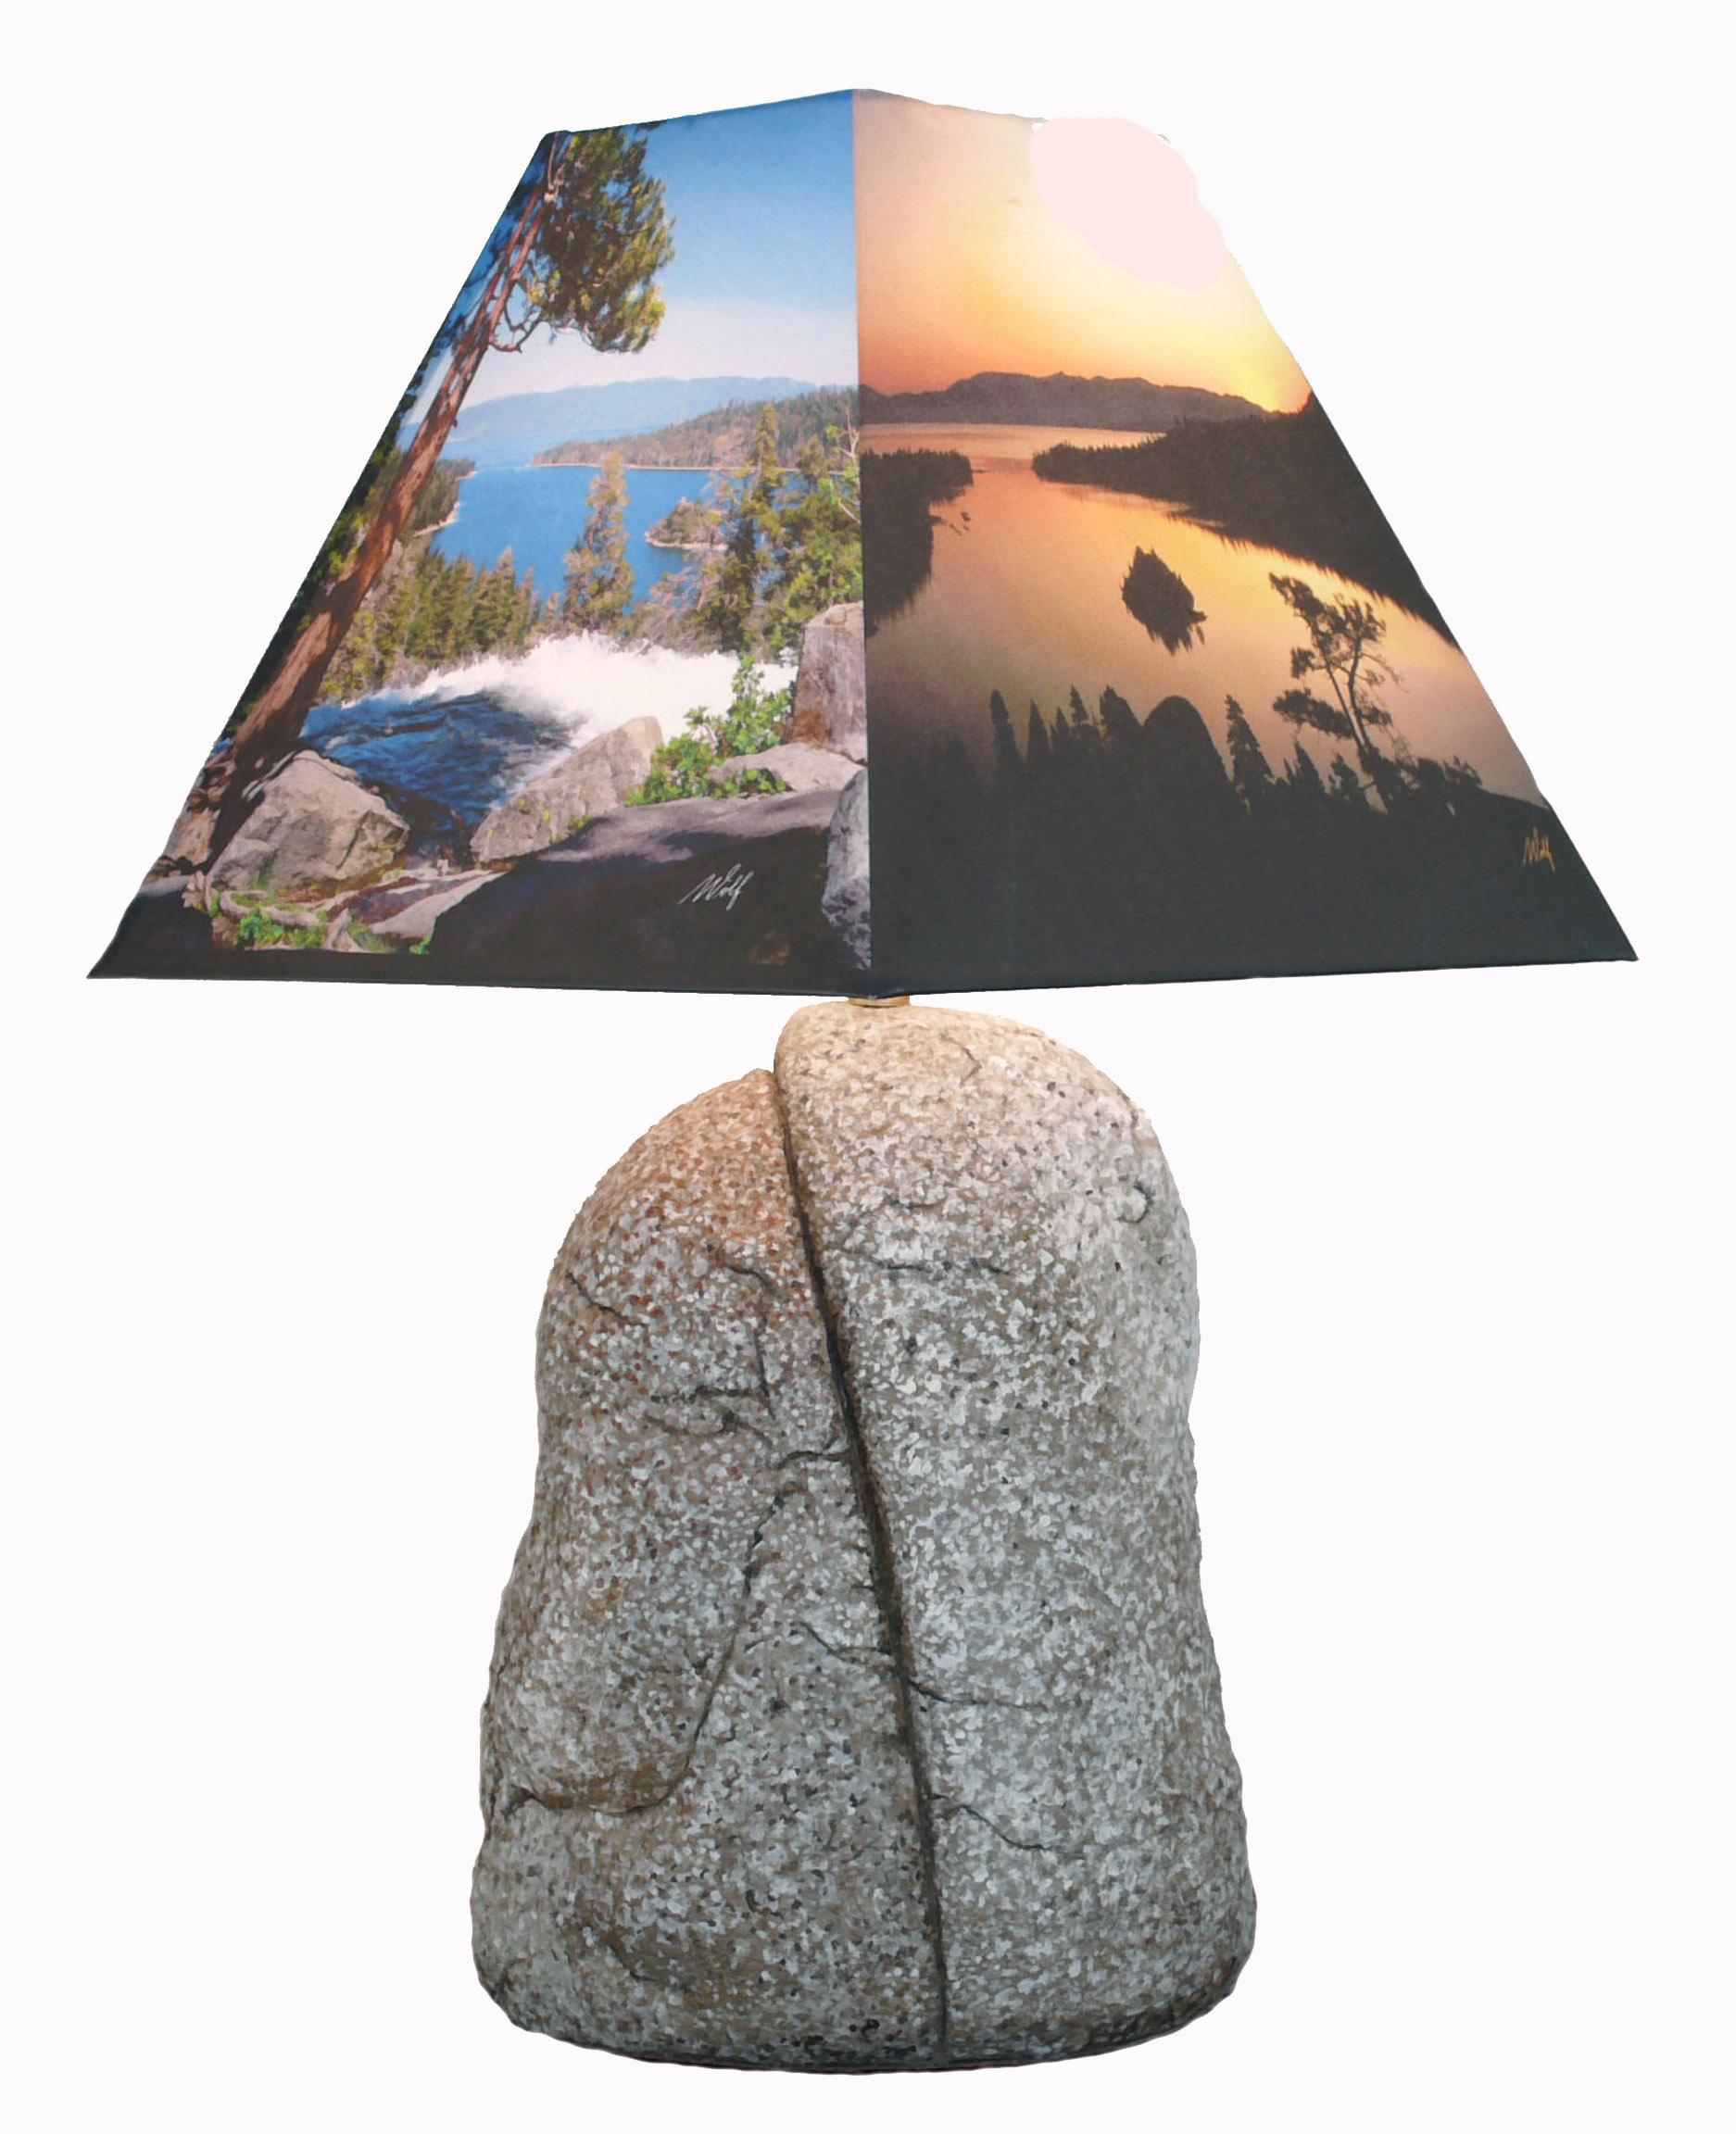 wsierra-granite-l.-w.-suare-shade-lit-l1050454.jpg